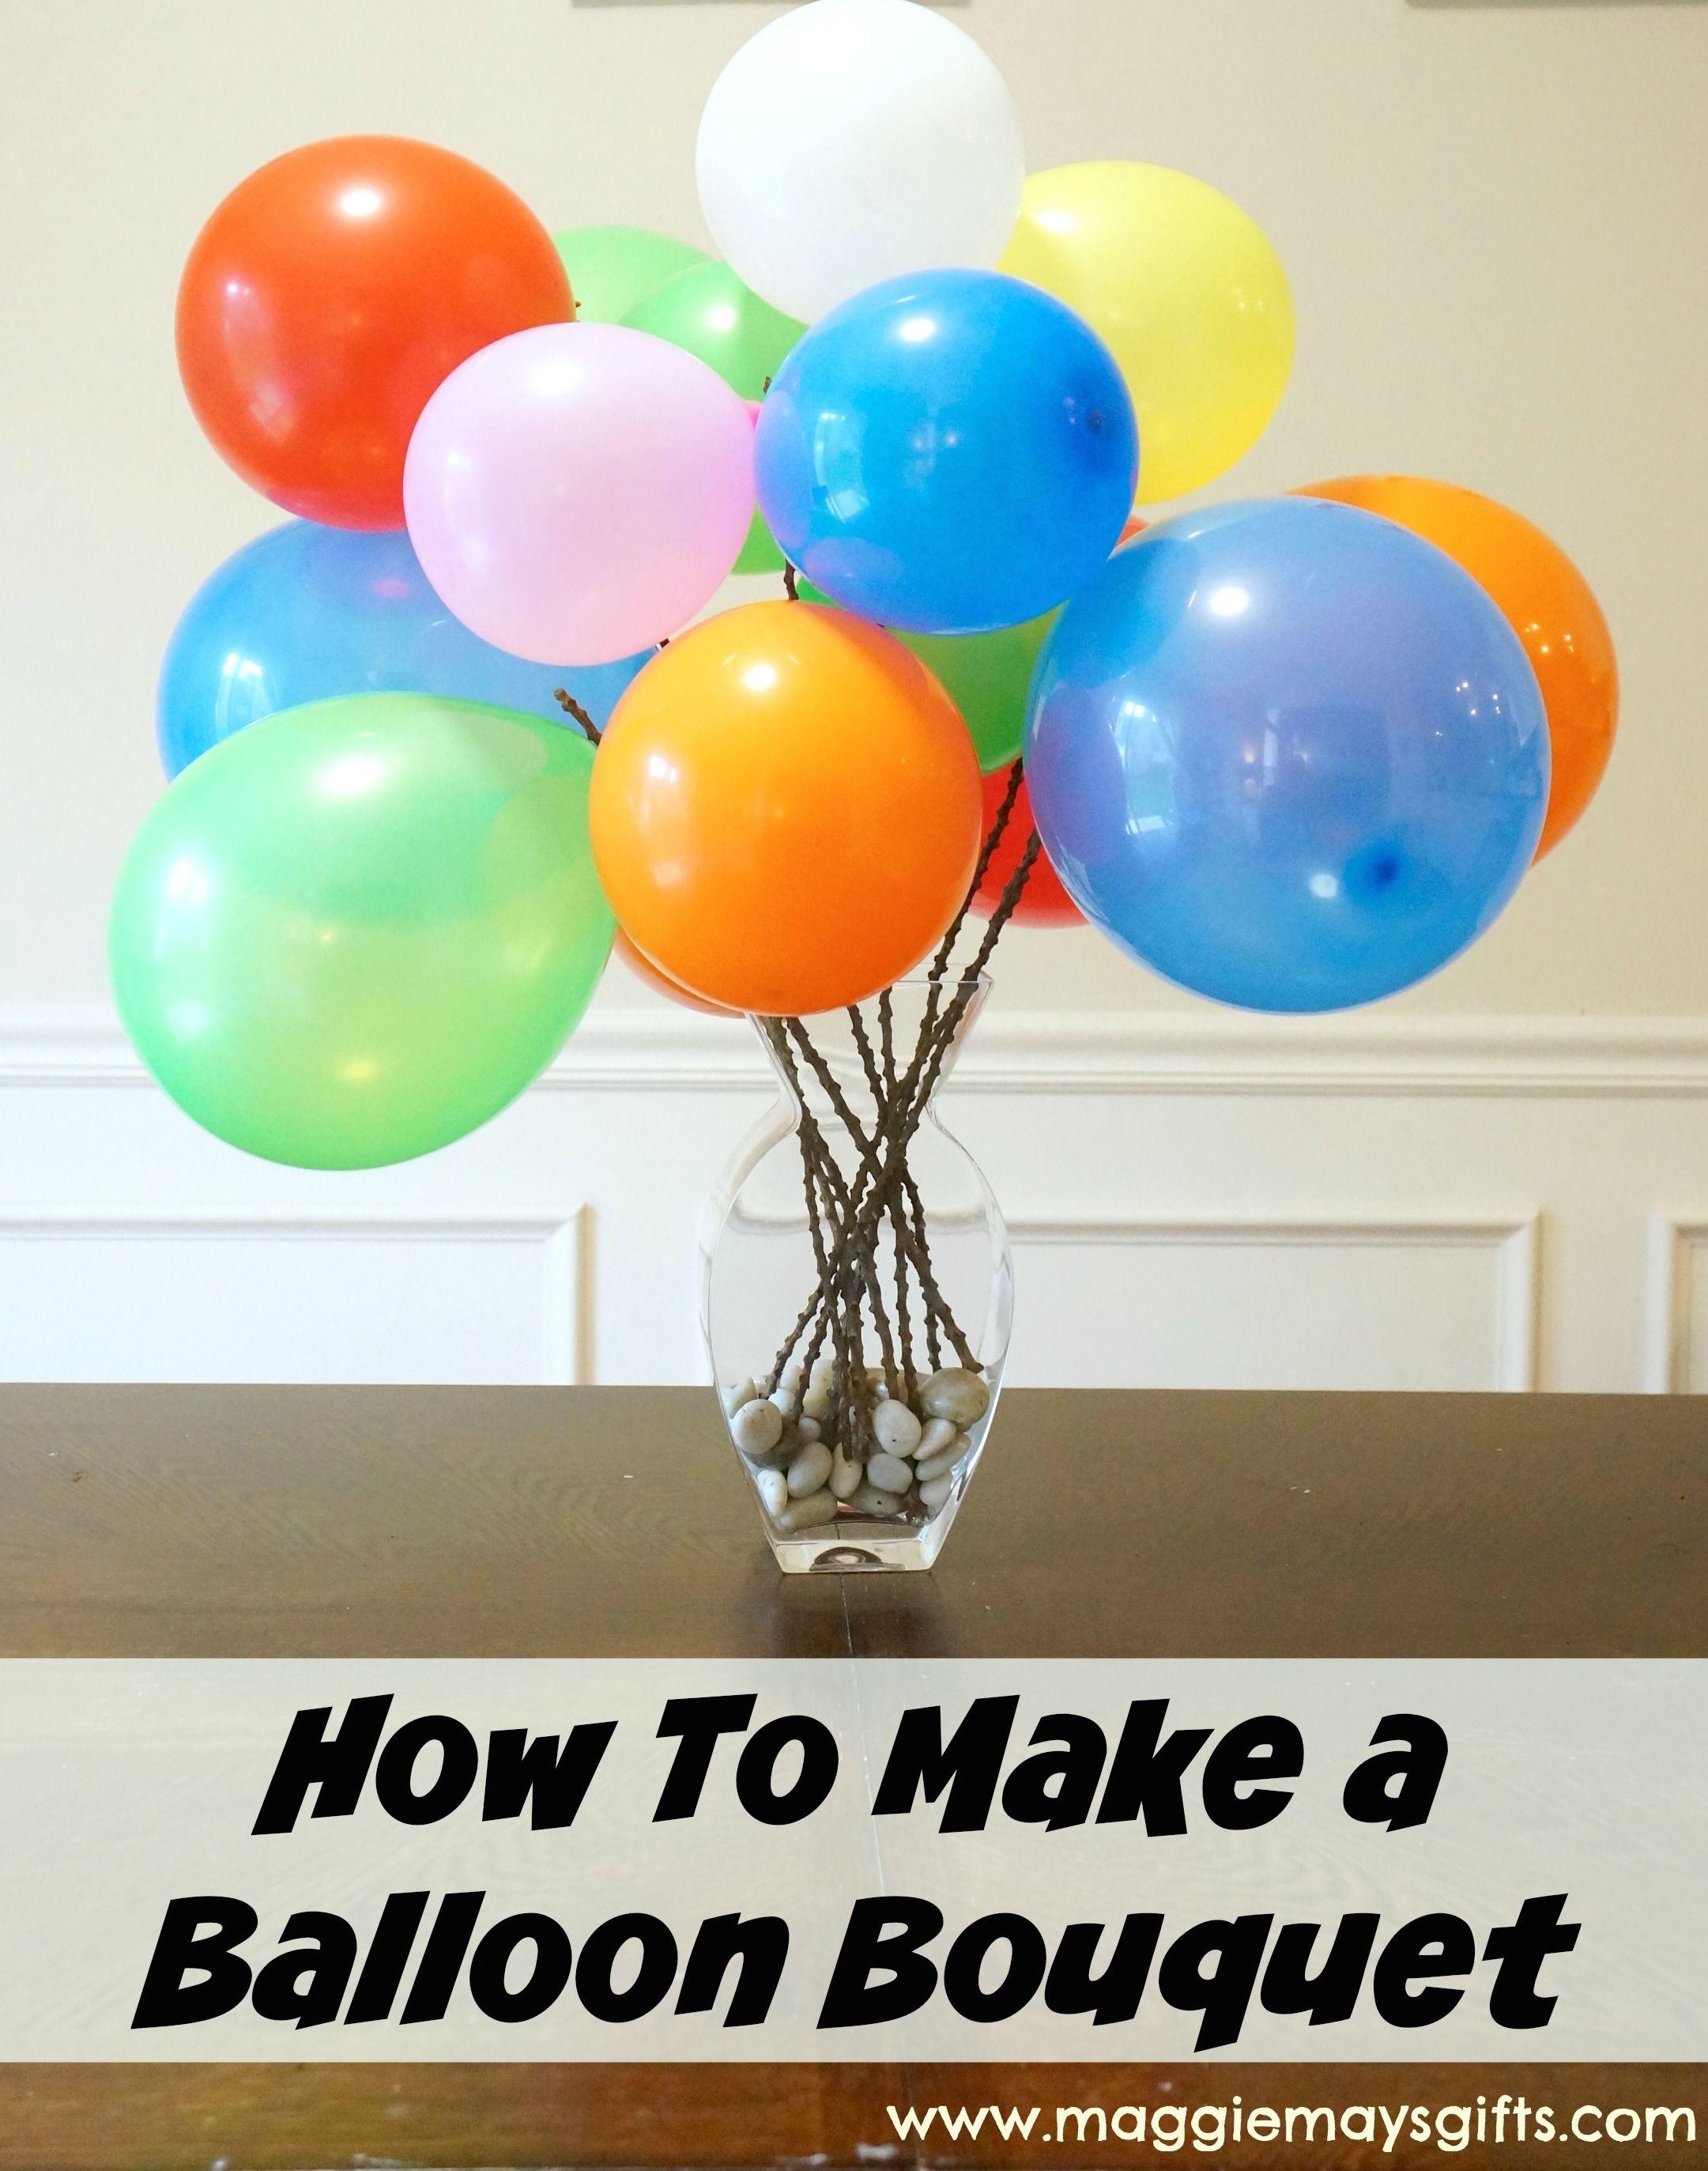 Make A Balloon Bouquet Balloon Bouquet Helium Balloons Decoration Balloon Decorations Without Helium